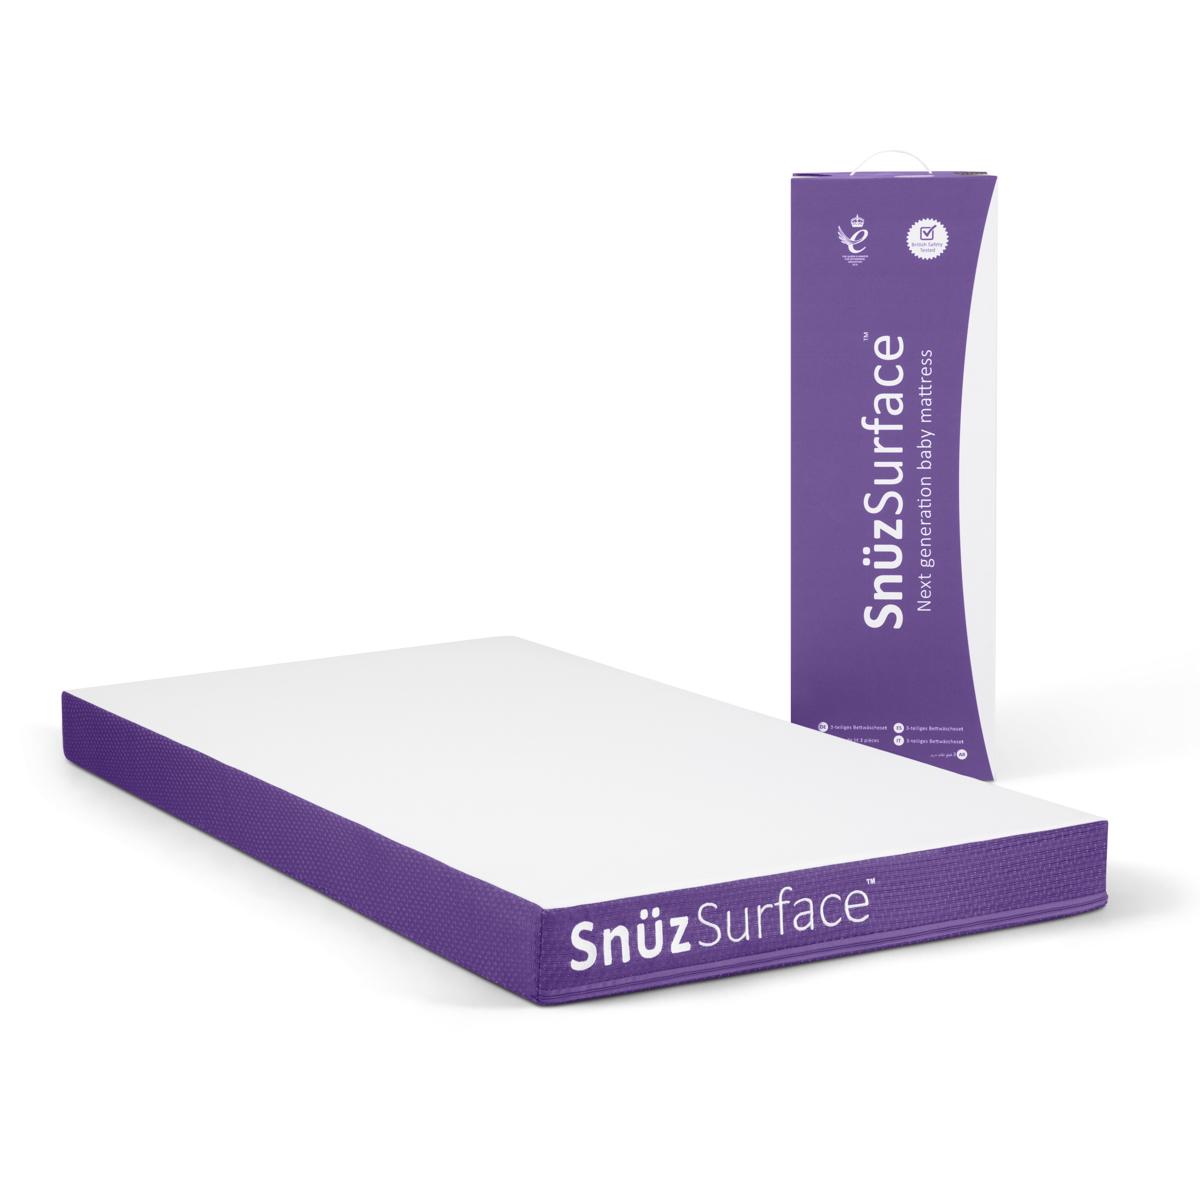 SnuzSurface Adaptable Cot Bed Mattress - 70x140